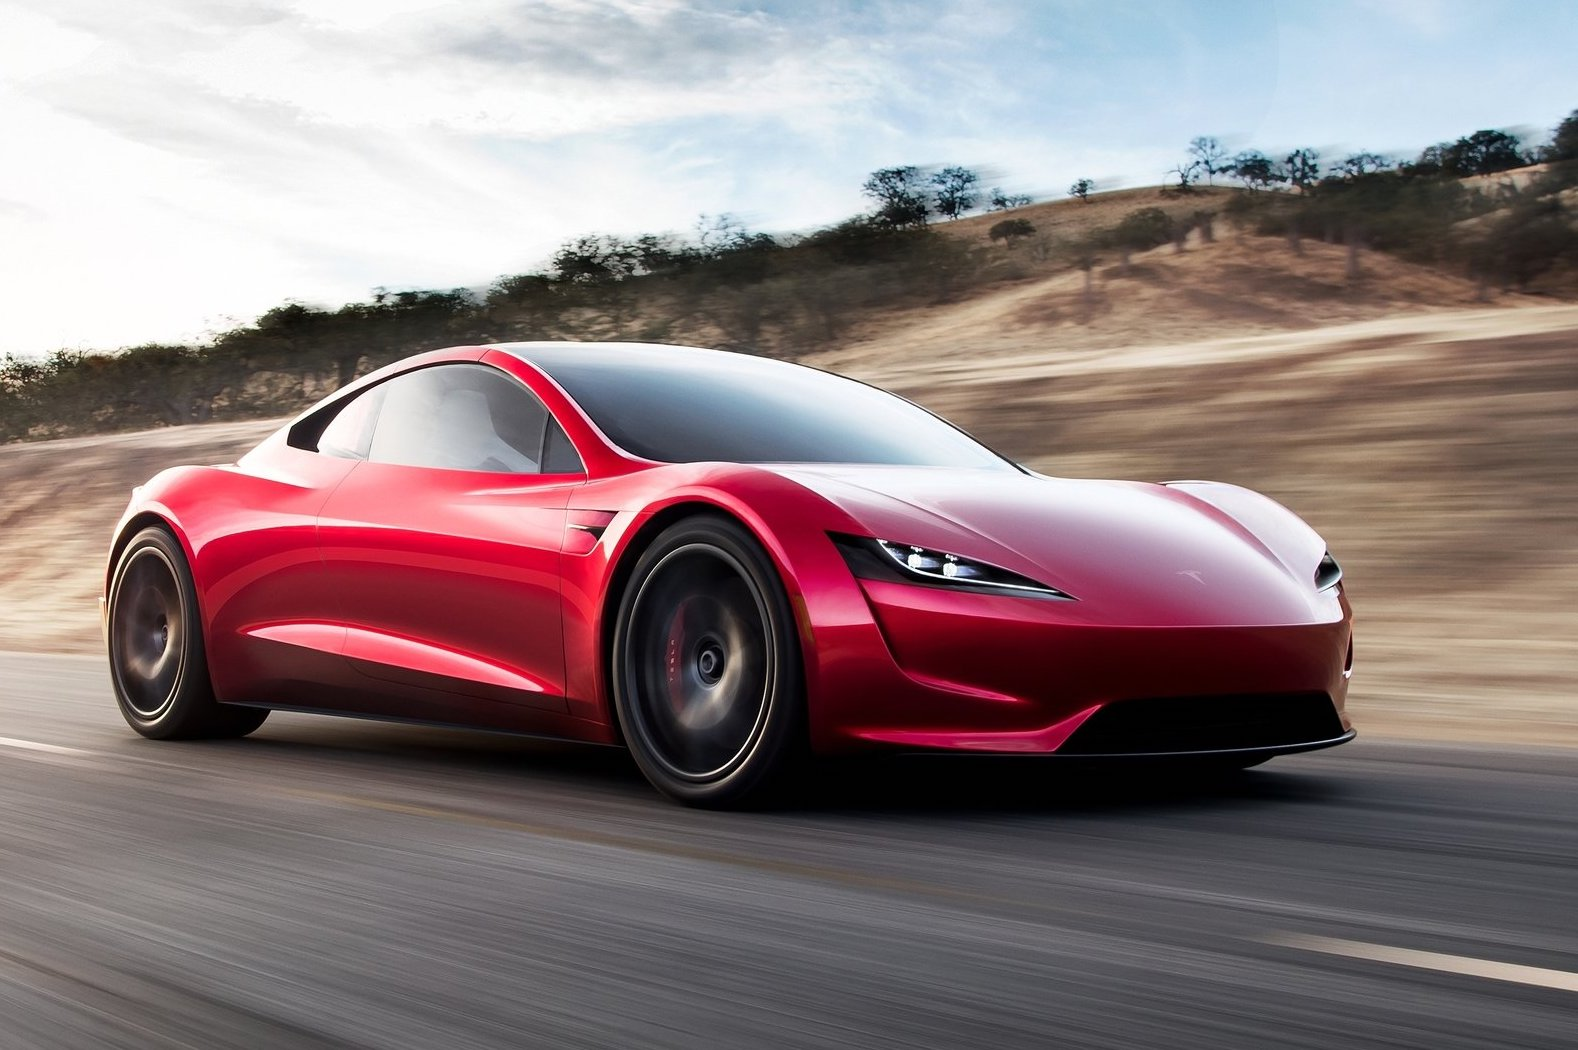 2020 Tesla Roadster revealed; 0-60mph in 1.9 sec, 1000km range